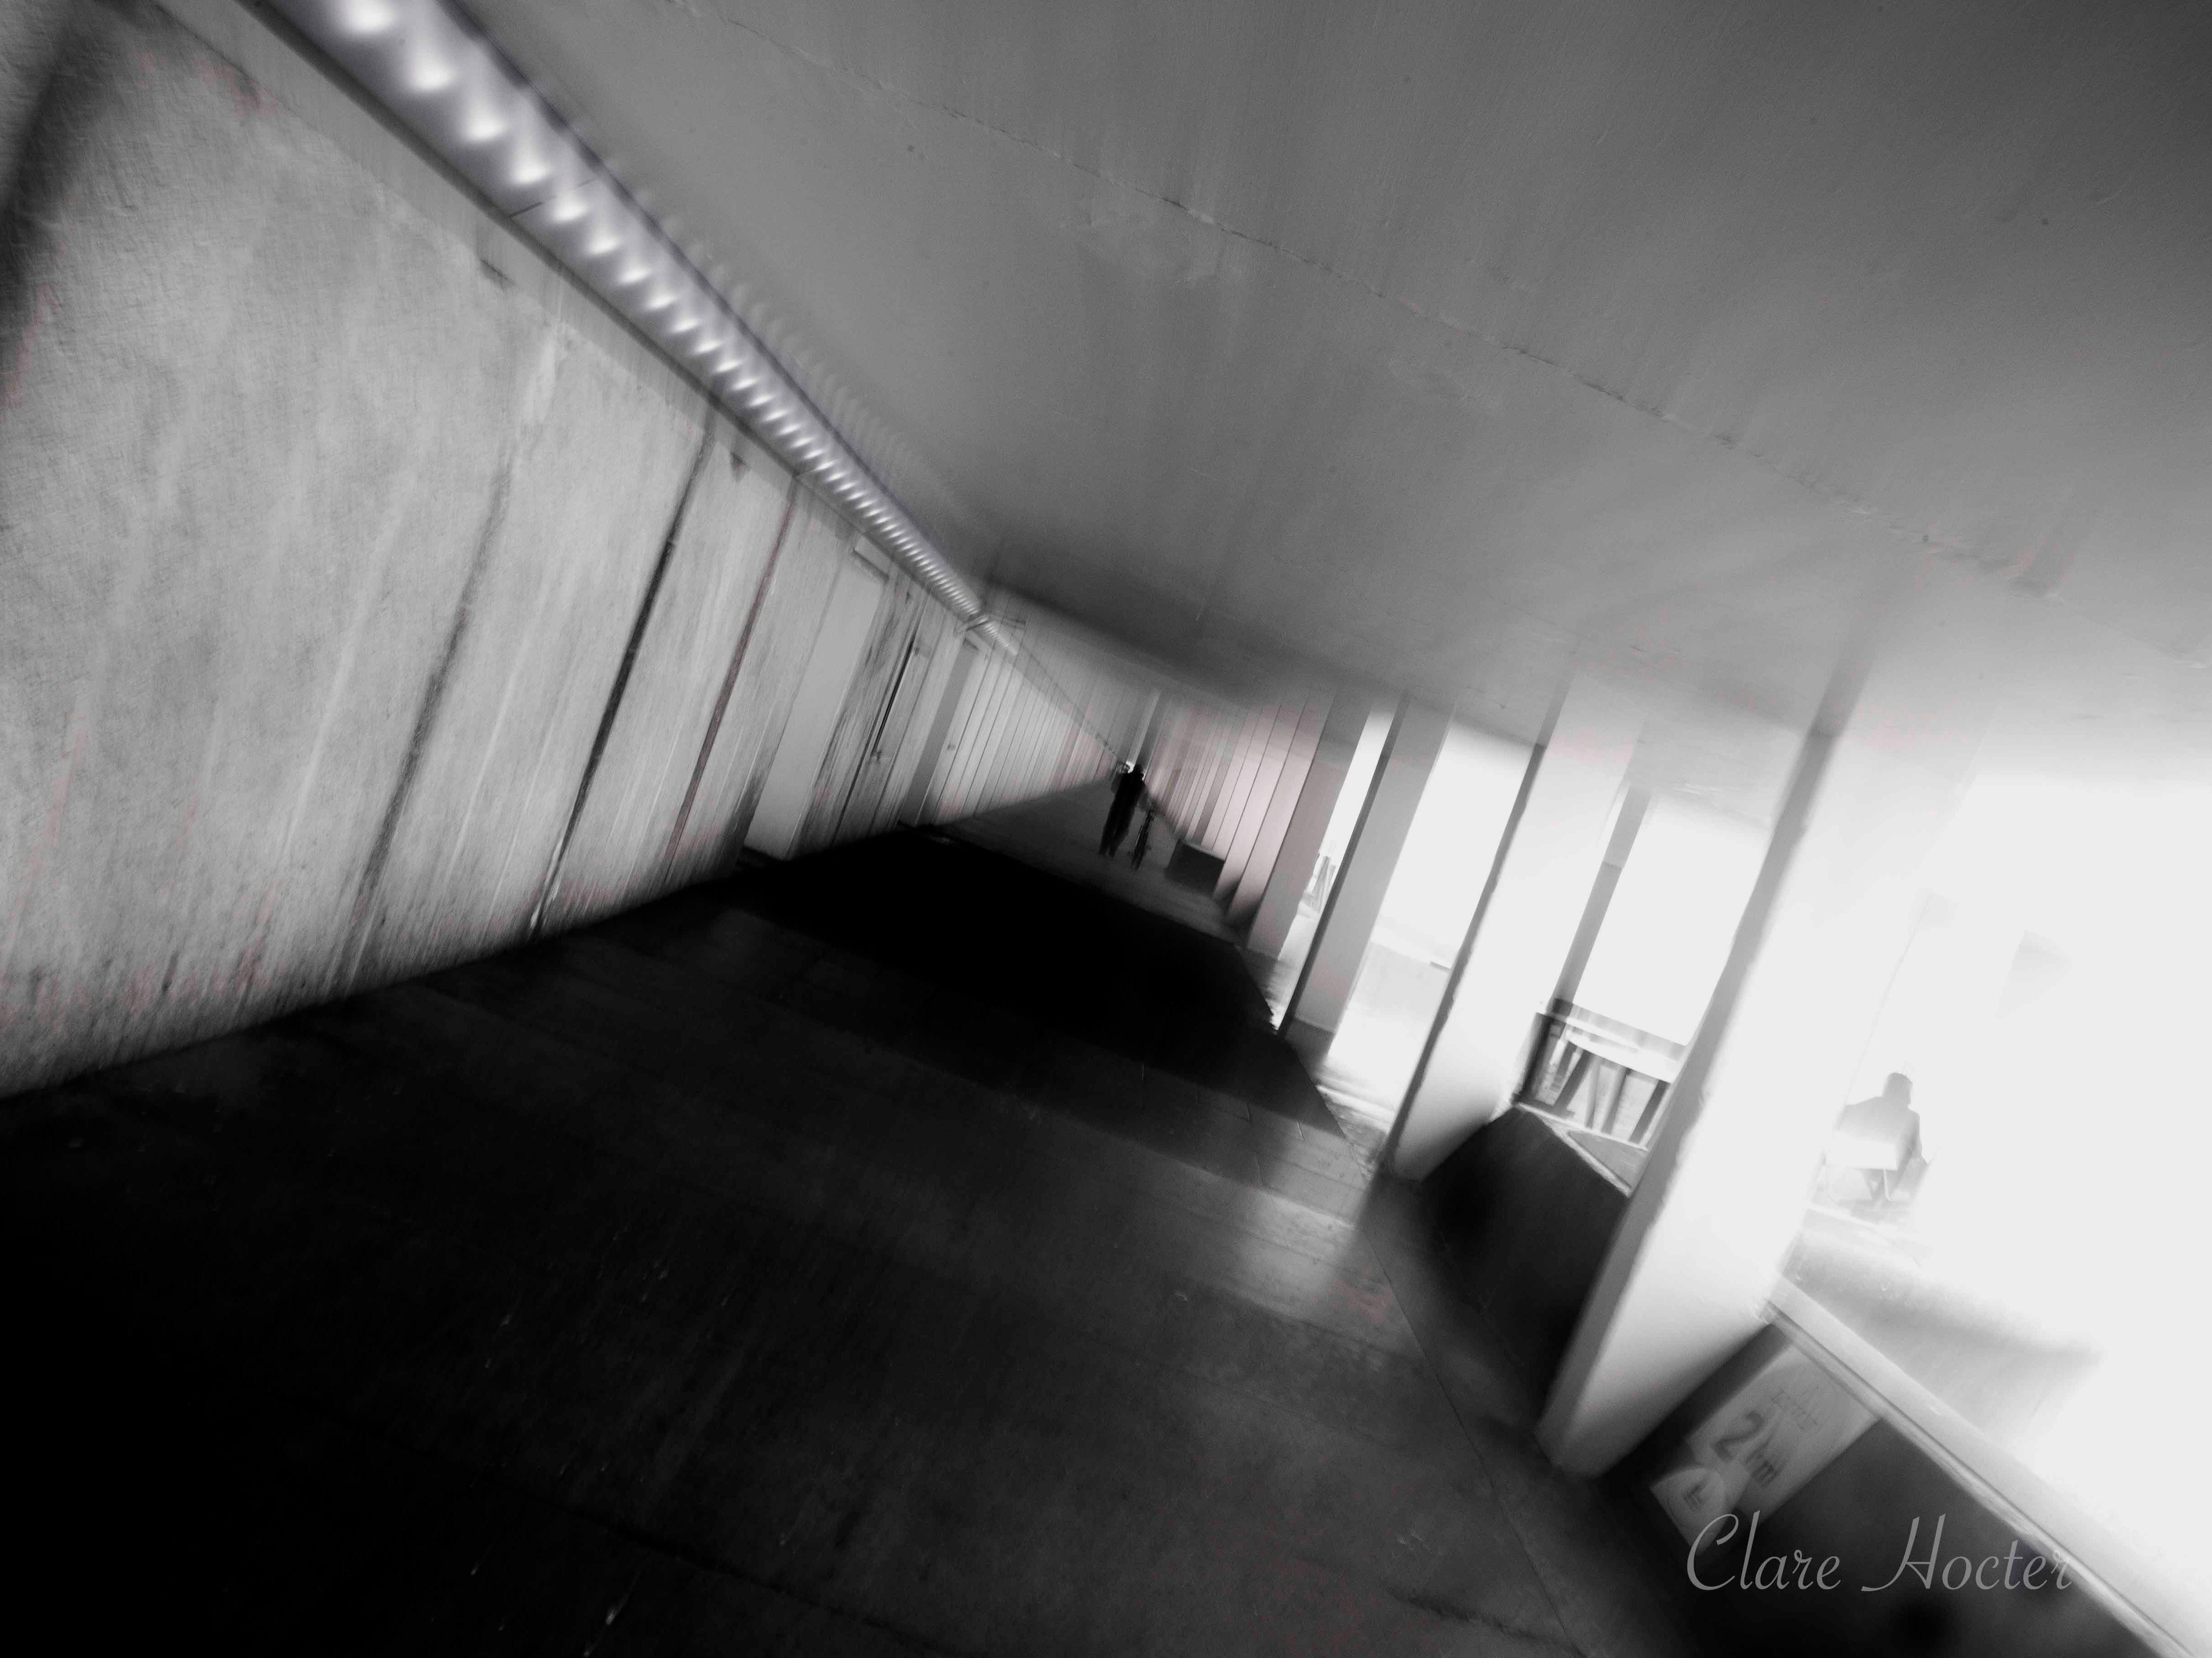 bottle alley, st leonards, photo clare hocter